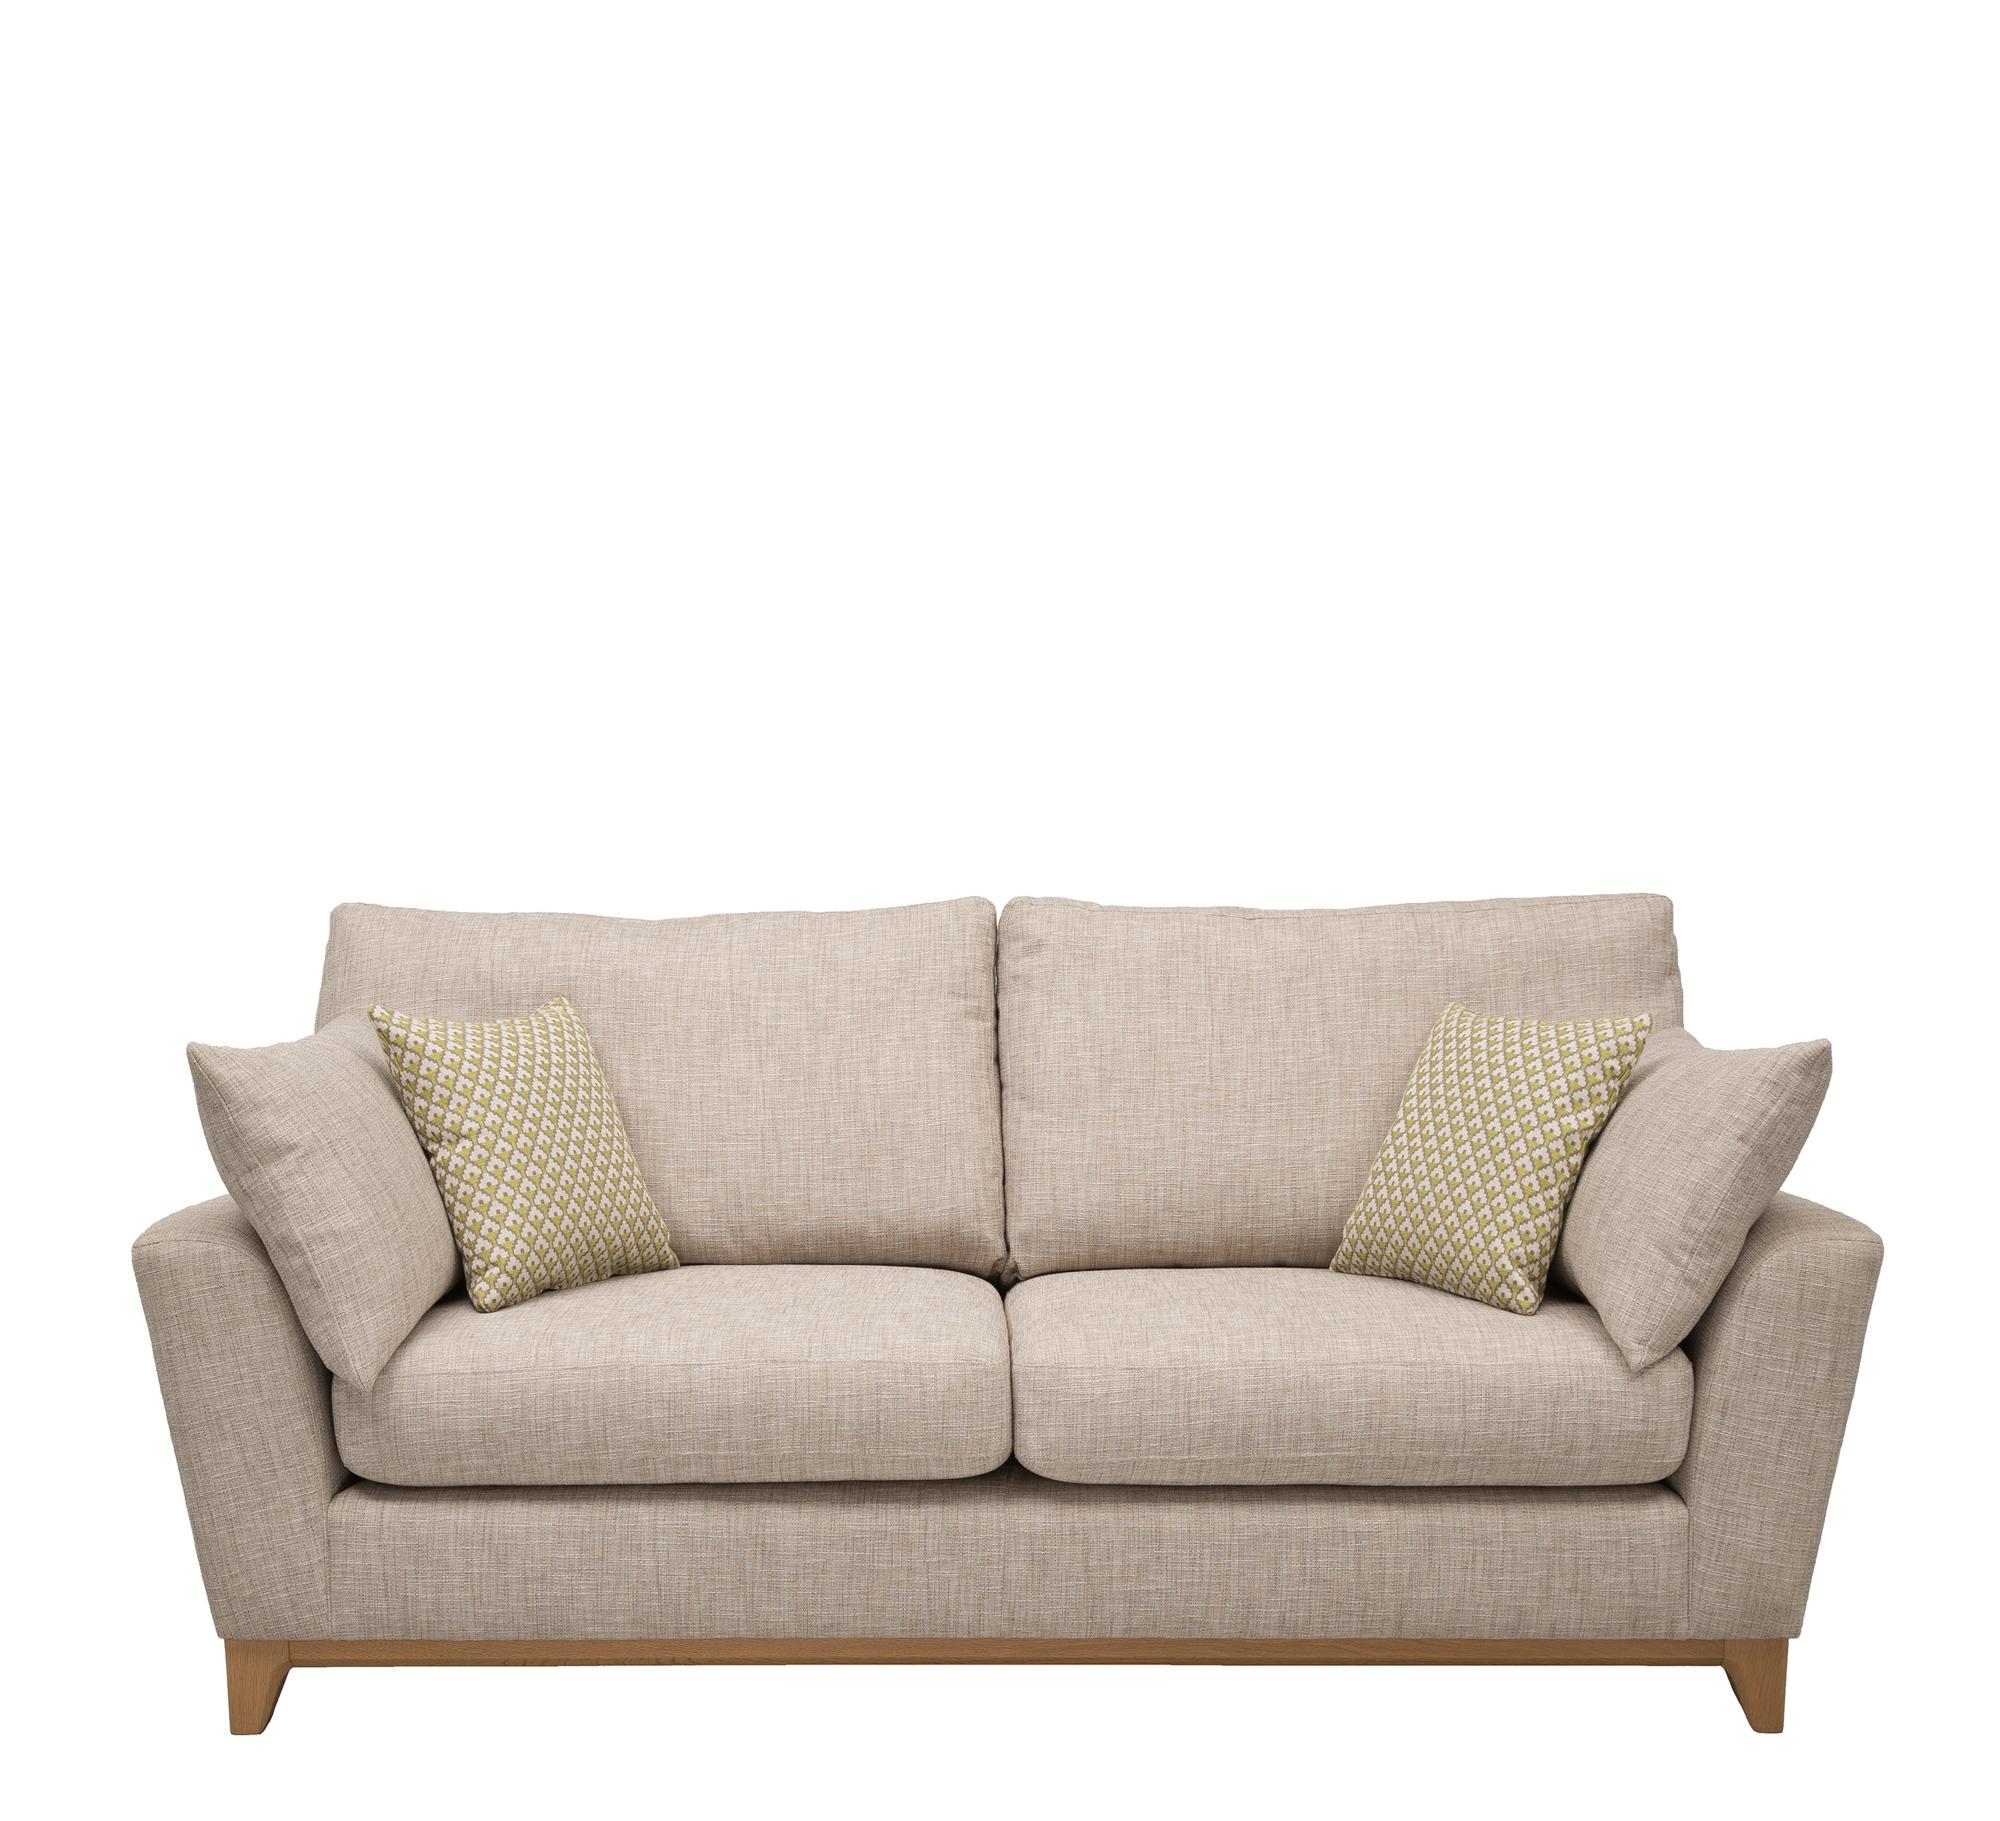 Novara large sofa ercol furniture